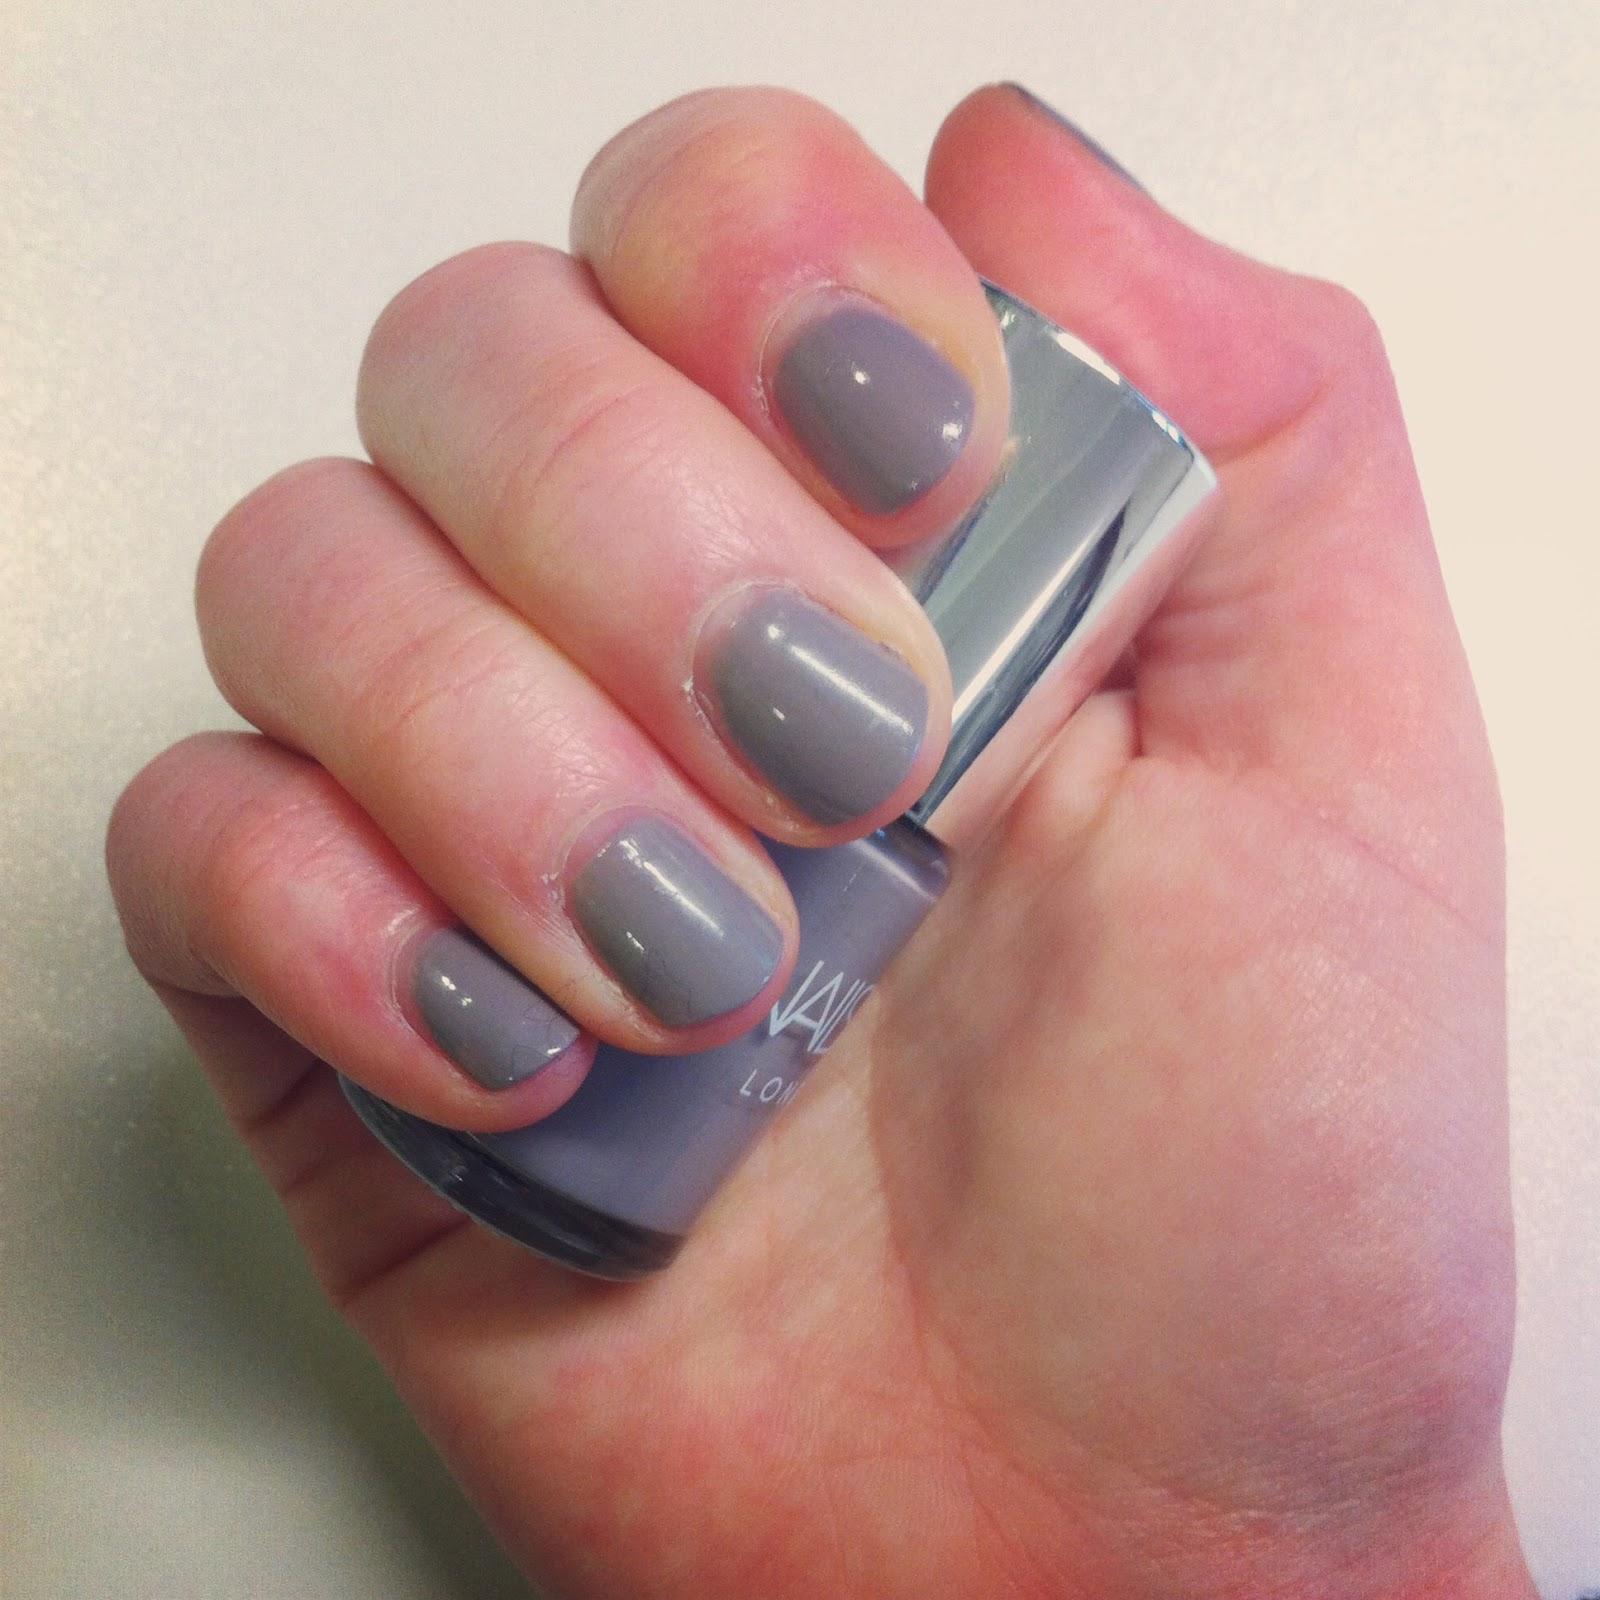 Nails Inc Porchester Square